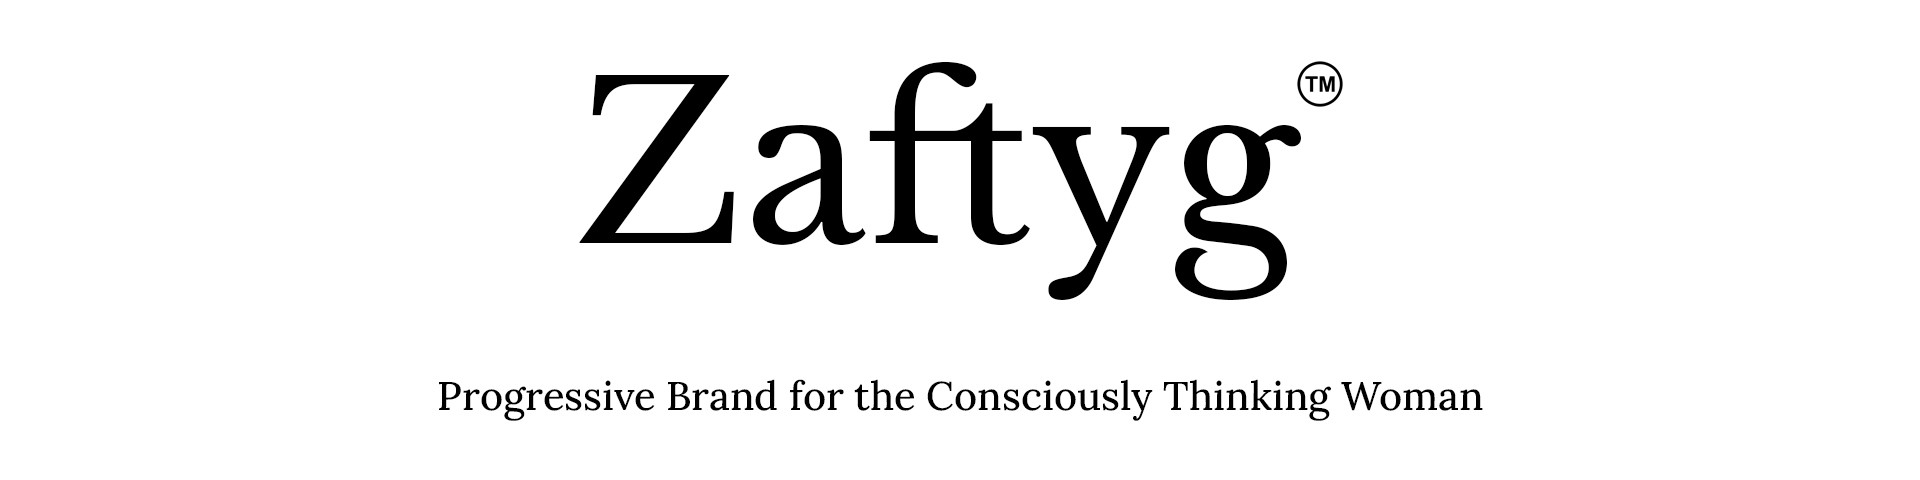 zaftyg progressive brand for consciously thinking woman